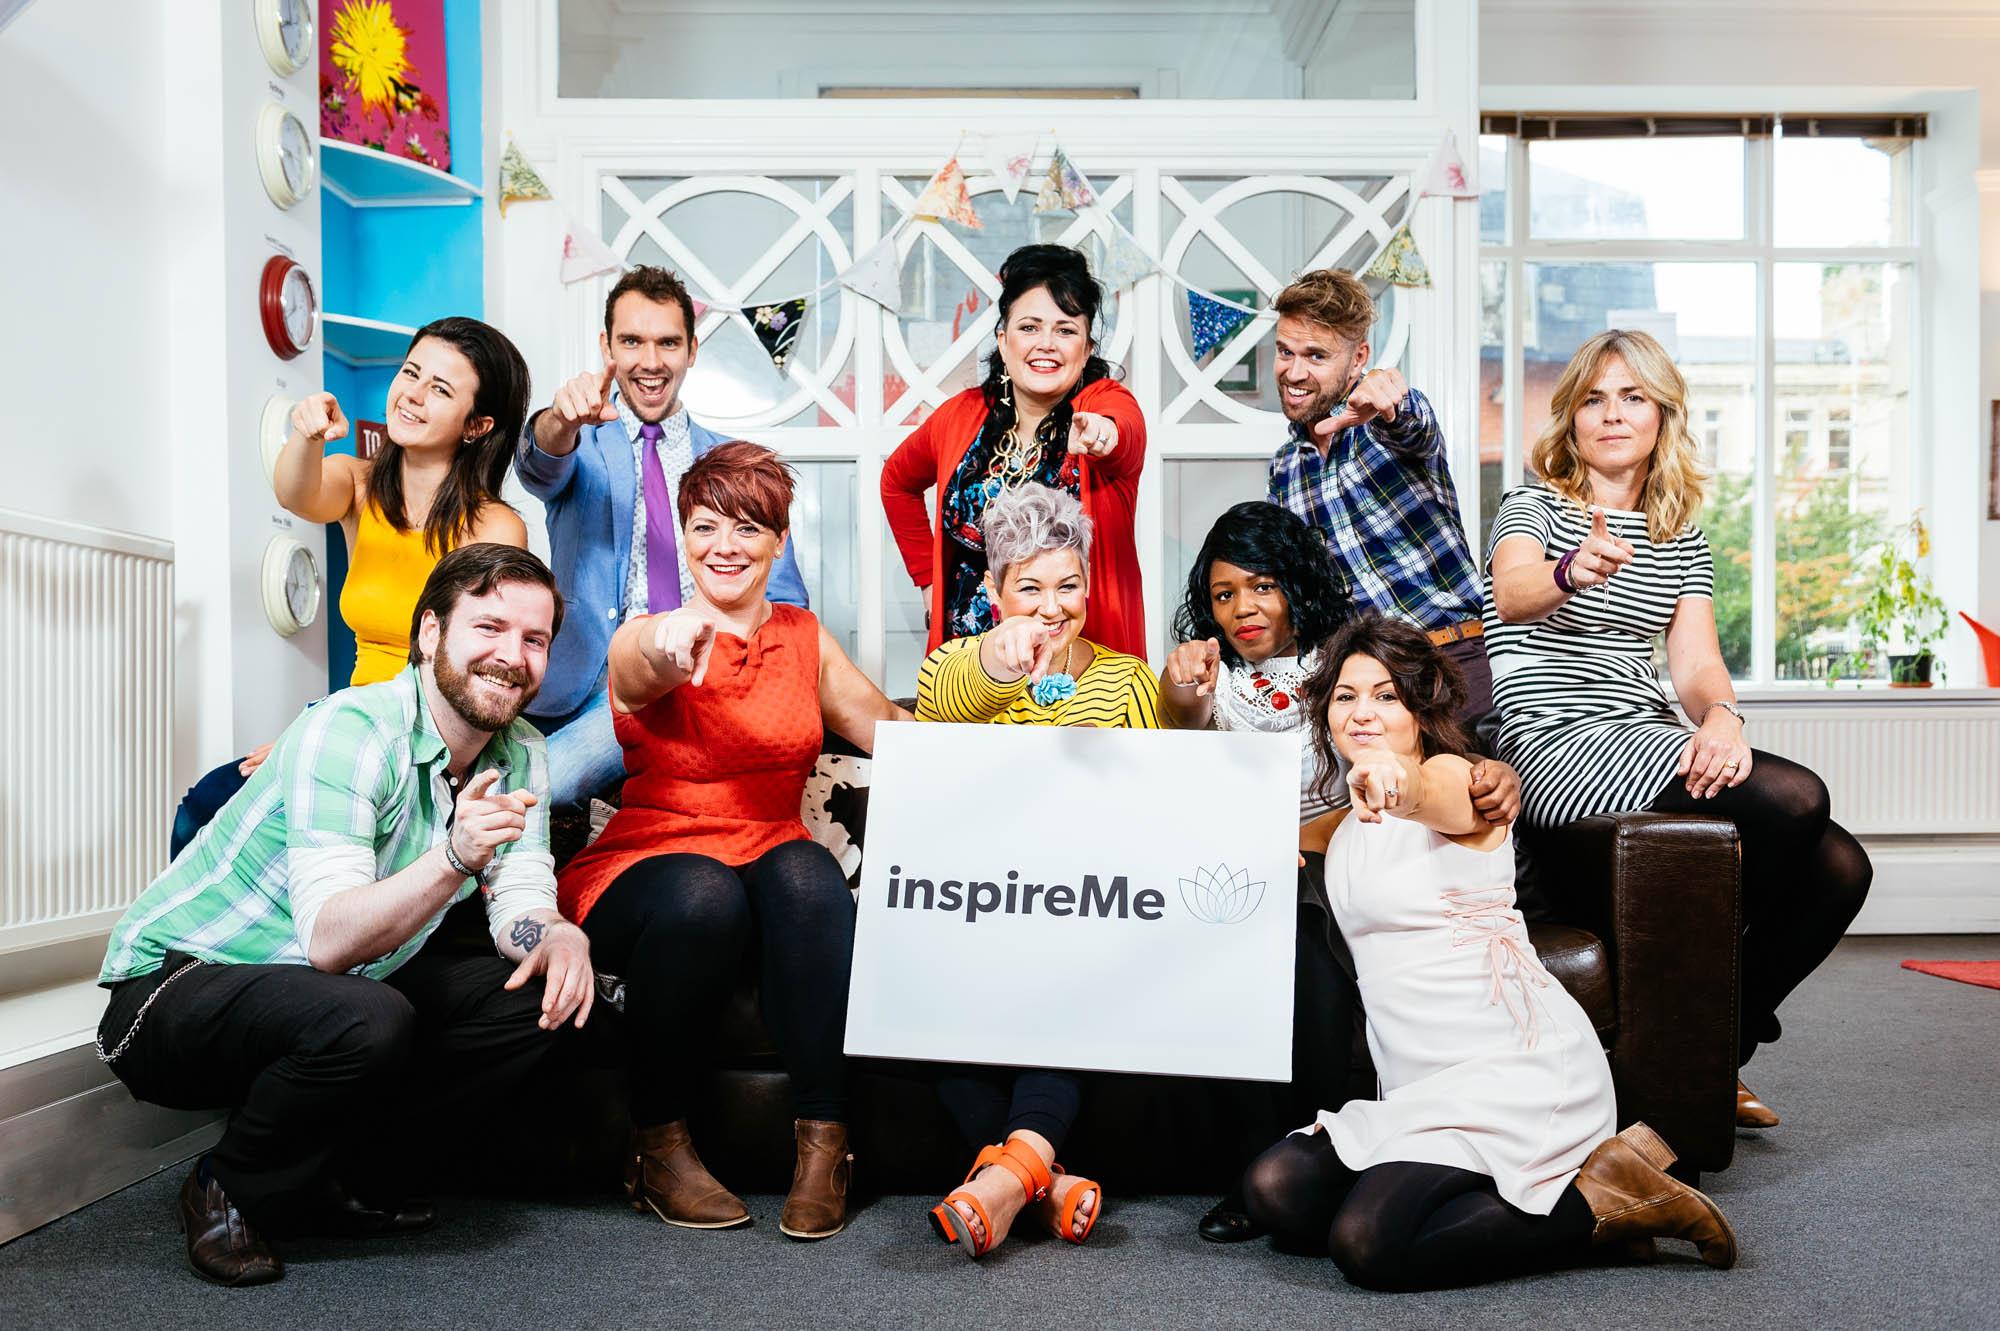 A team photo of a fun team in a colourful office